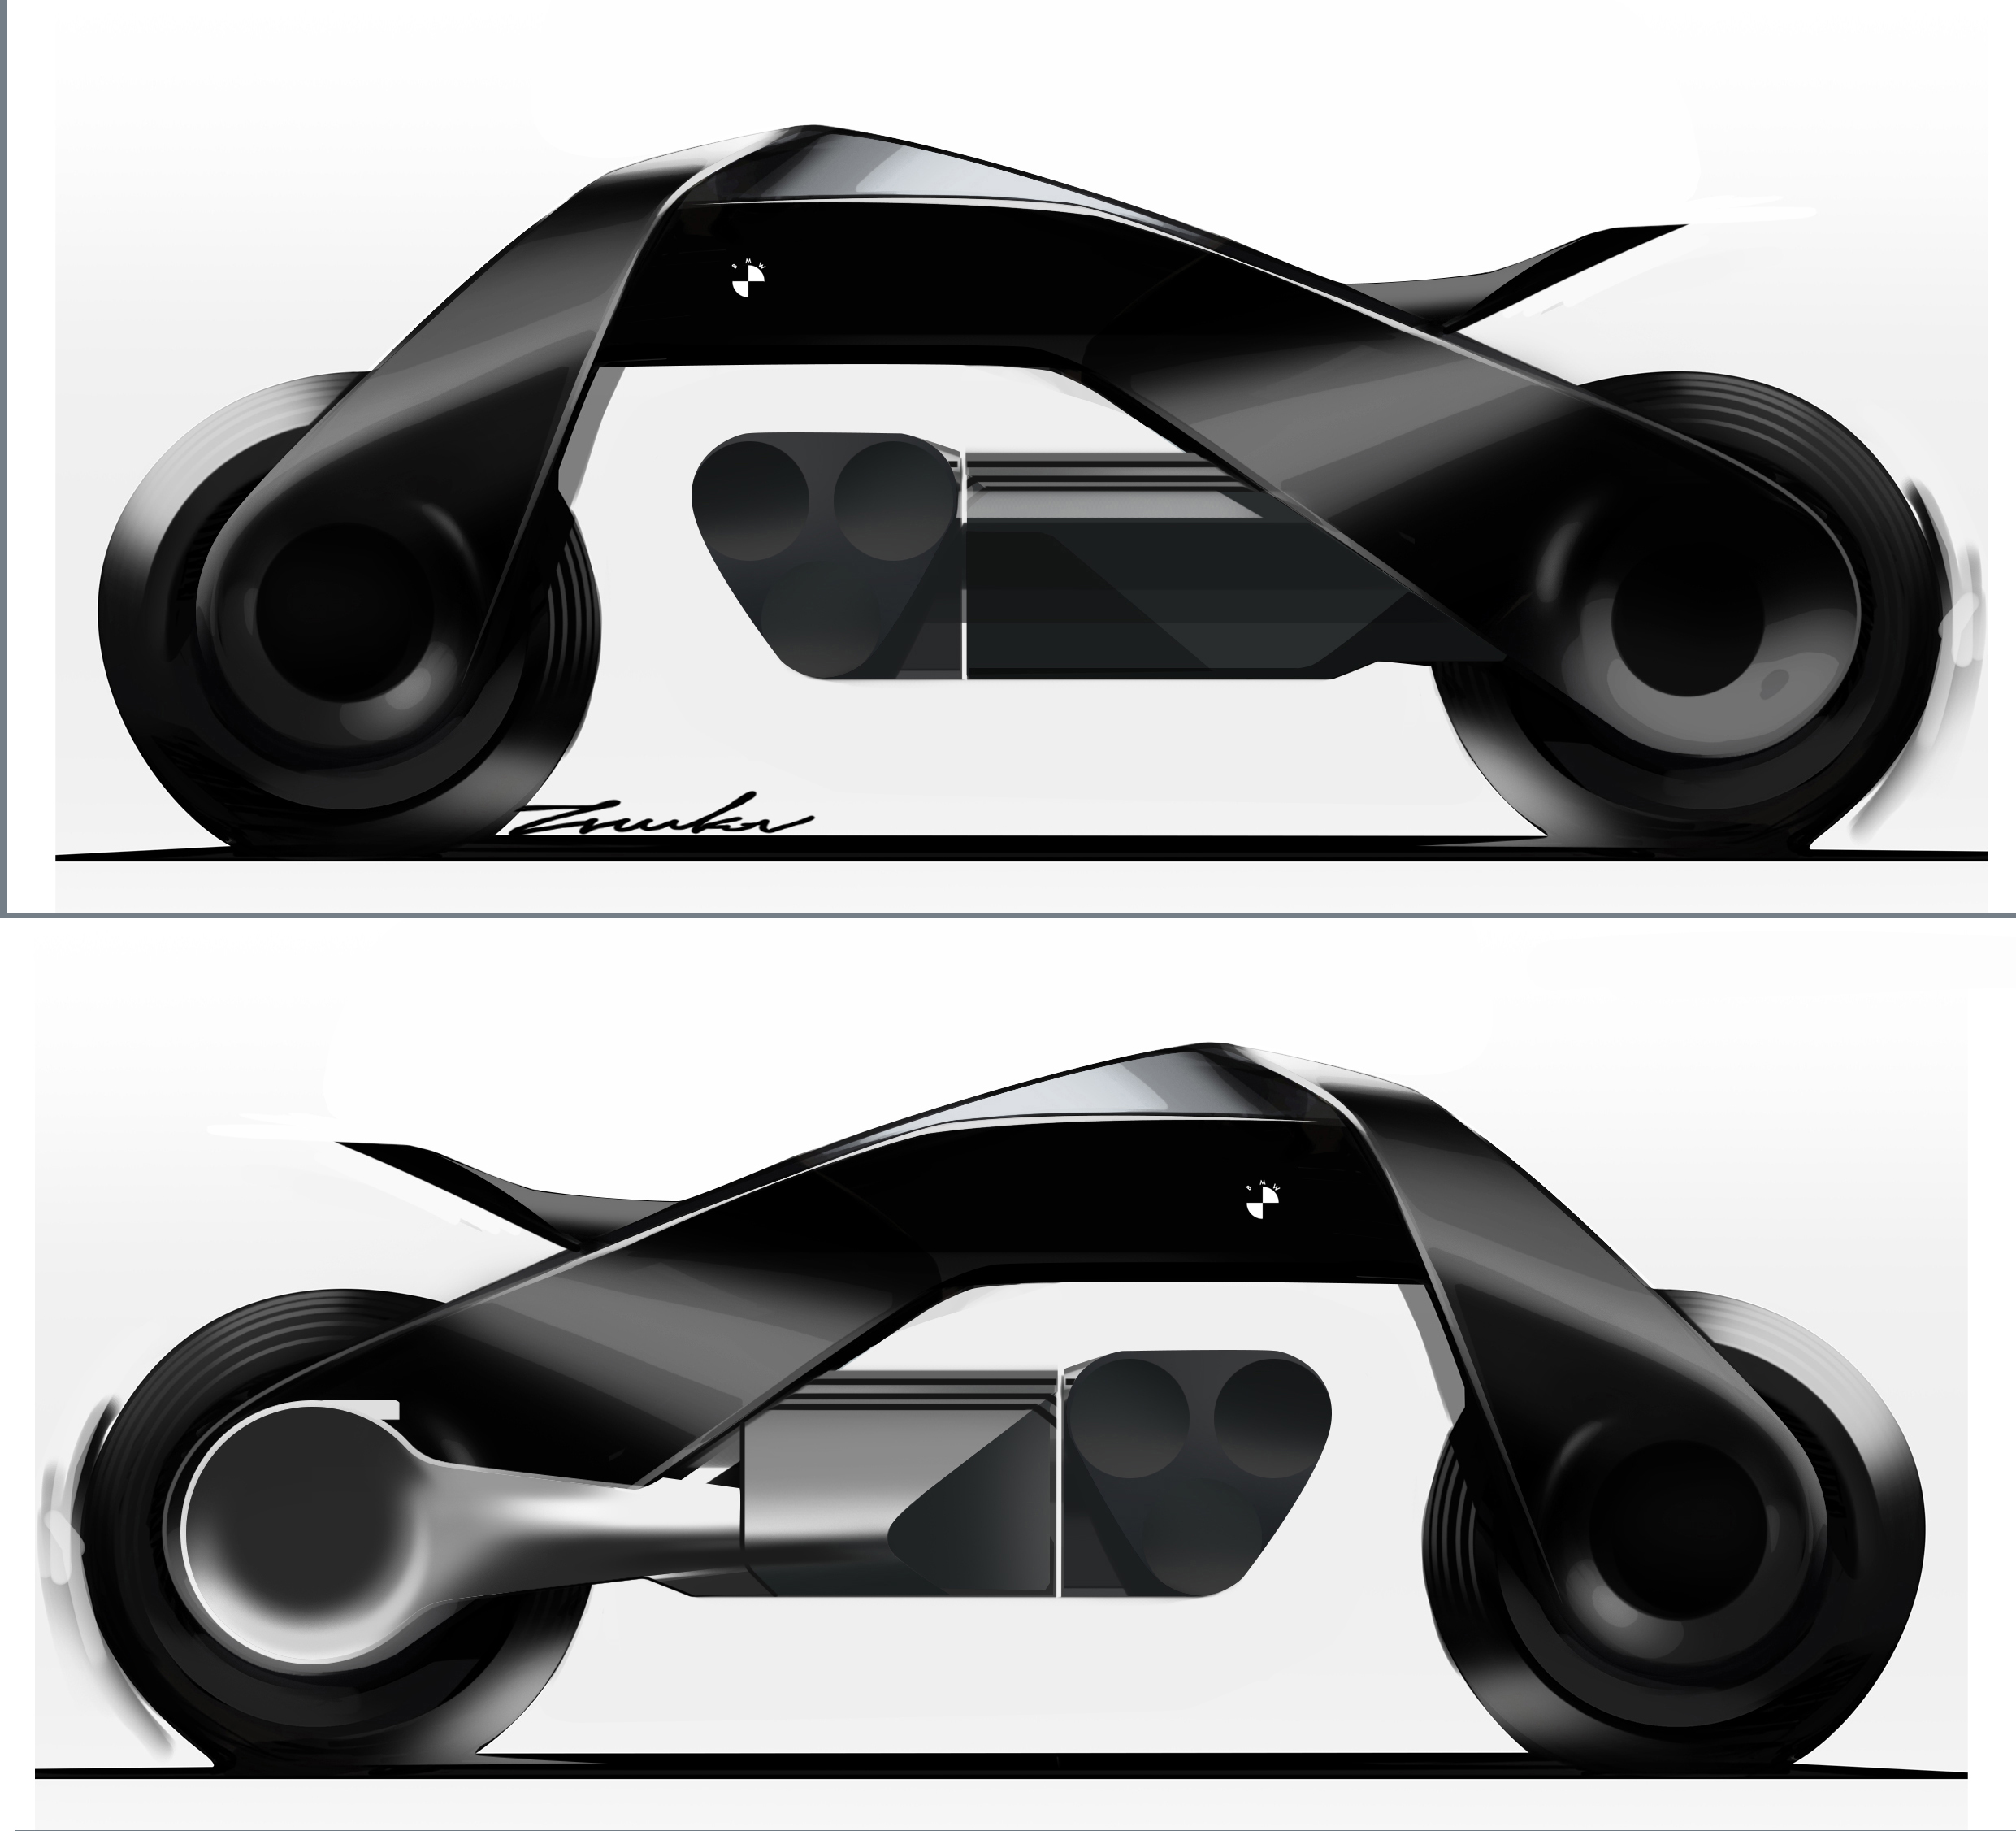 P90238730_highRes_sketch-bmw-motorrad-.jpg